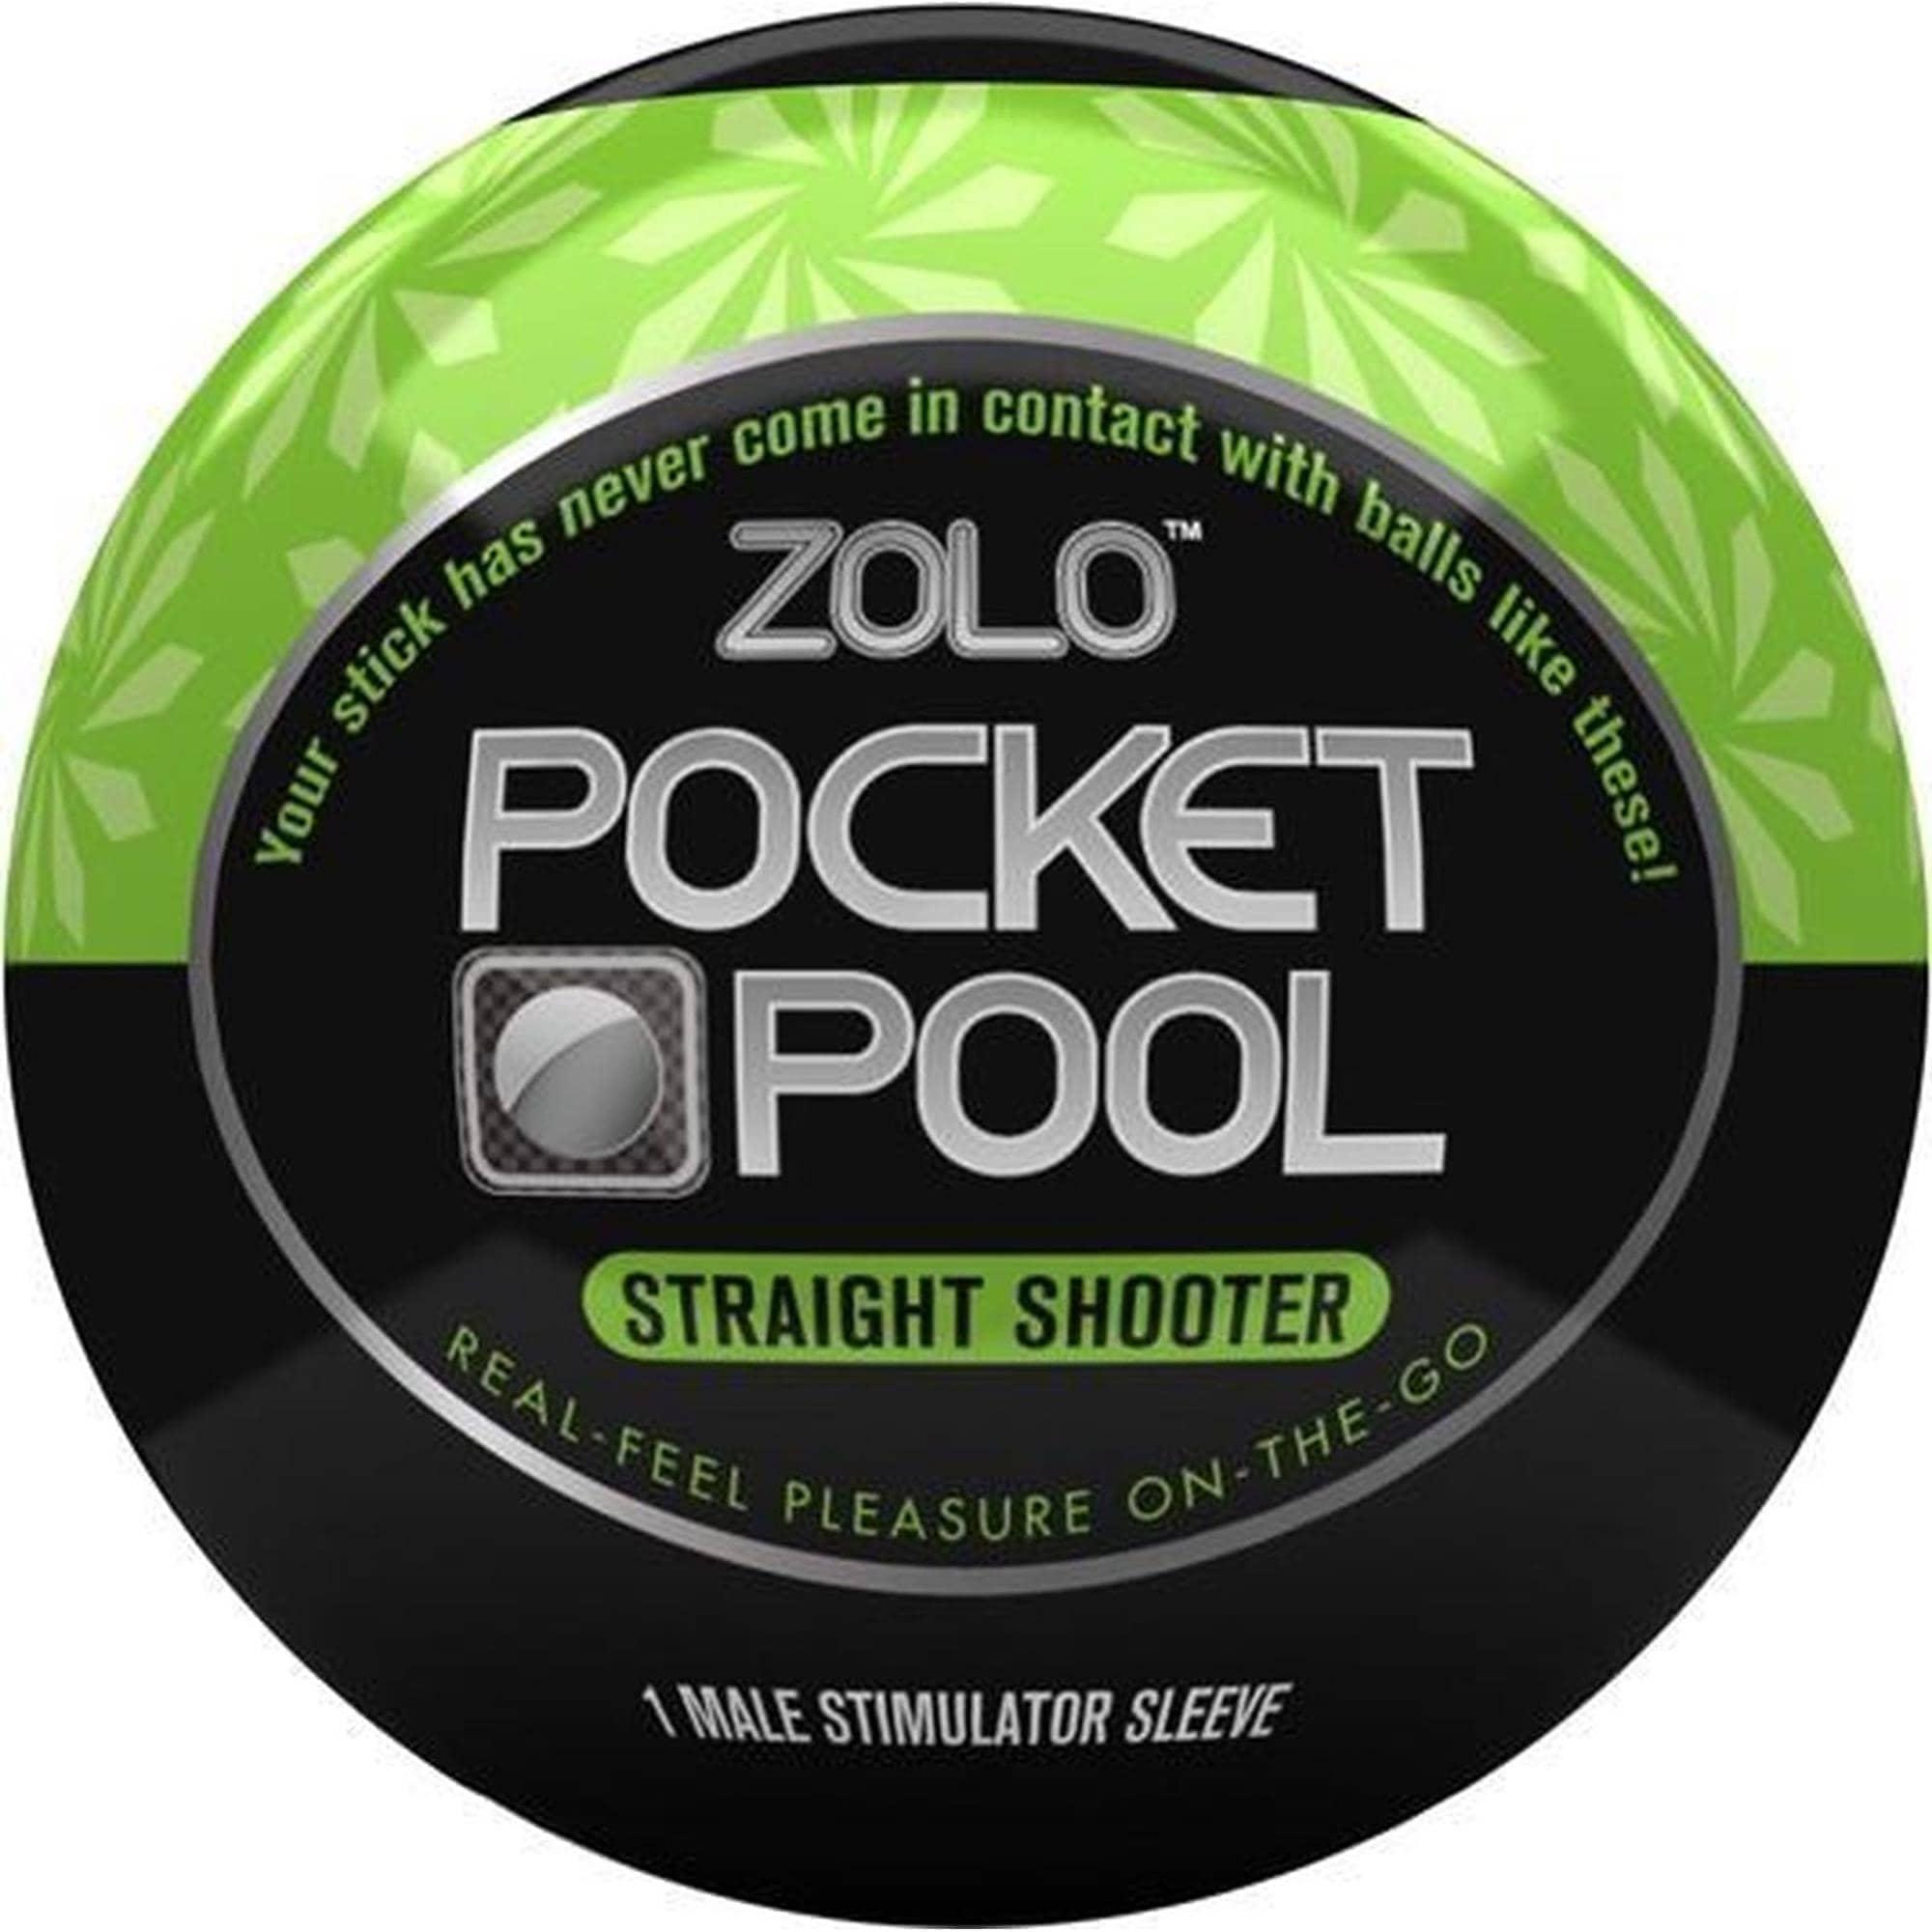 Zolo - Pocket Pool Straight Shooter Black/Green